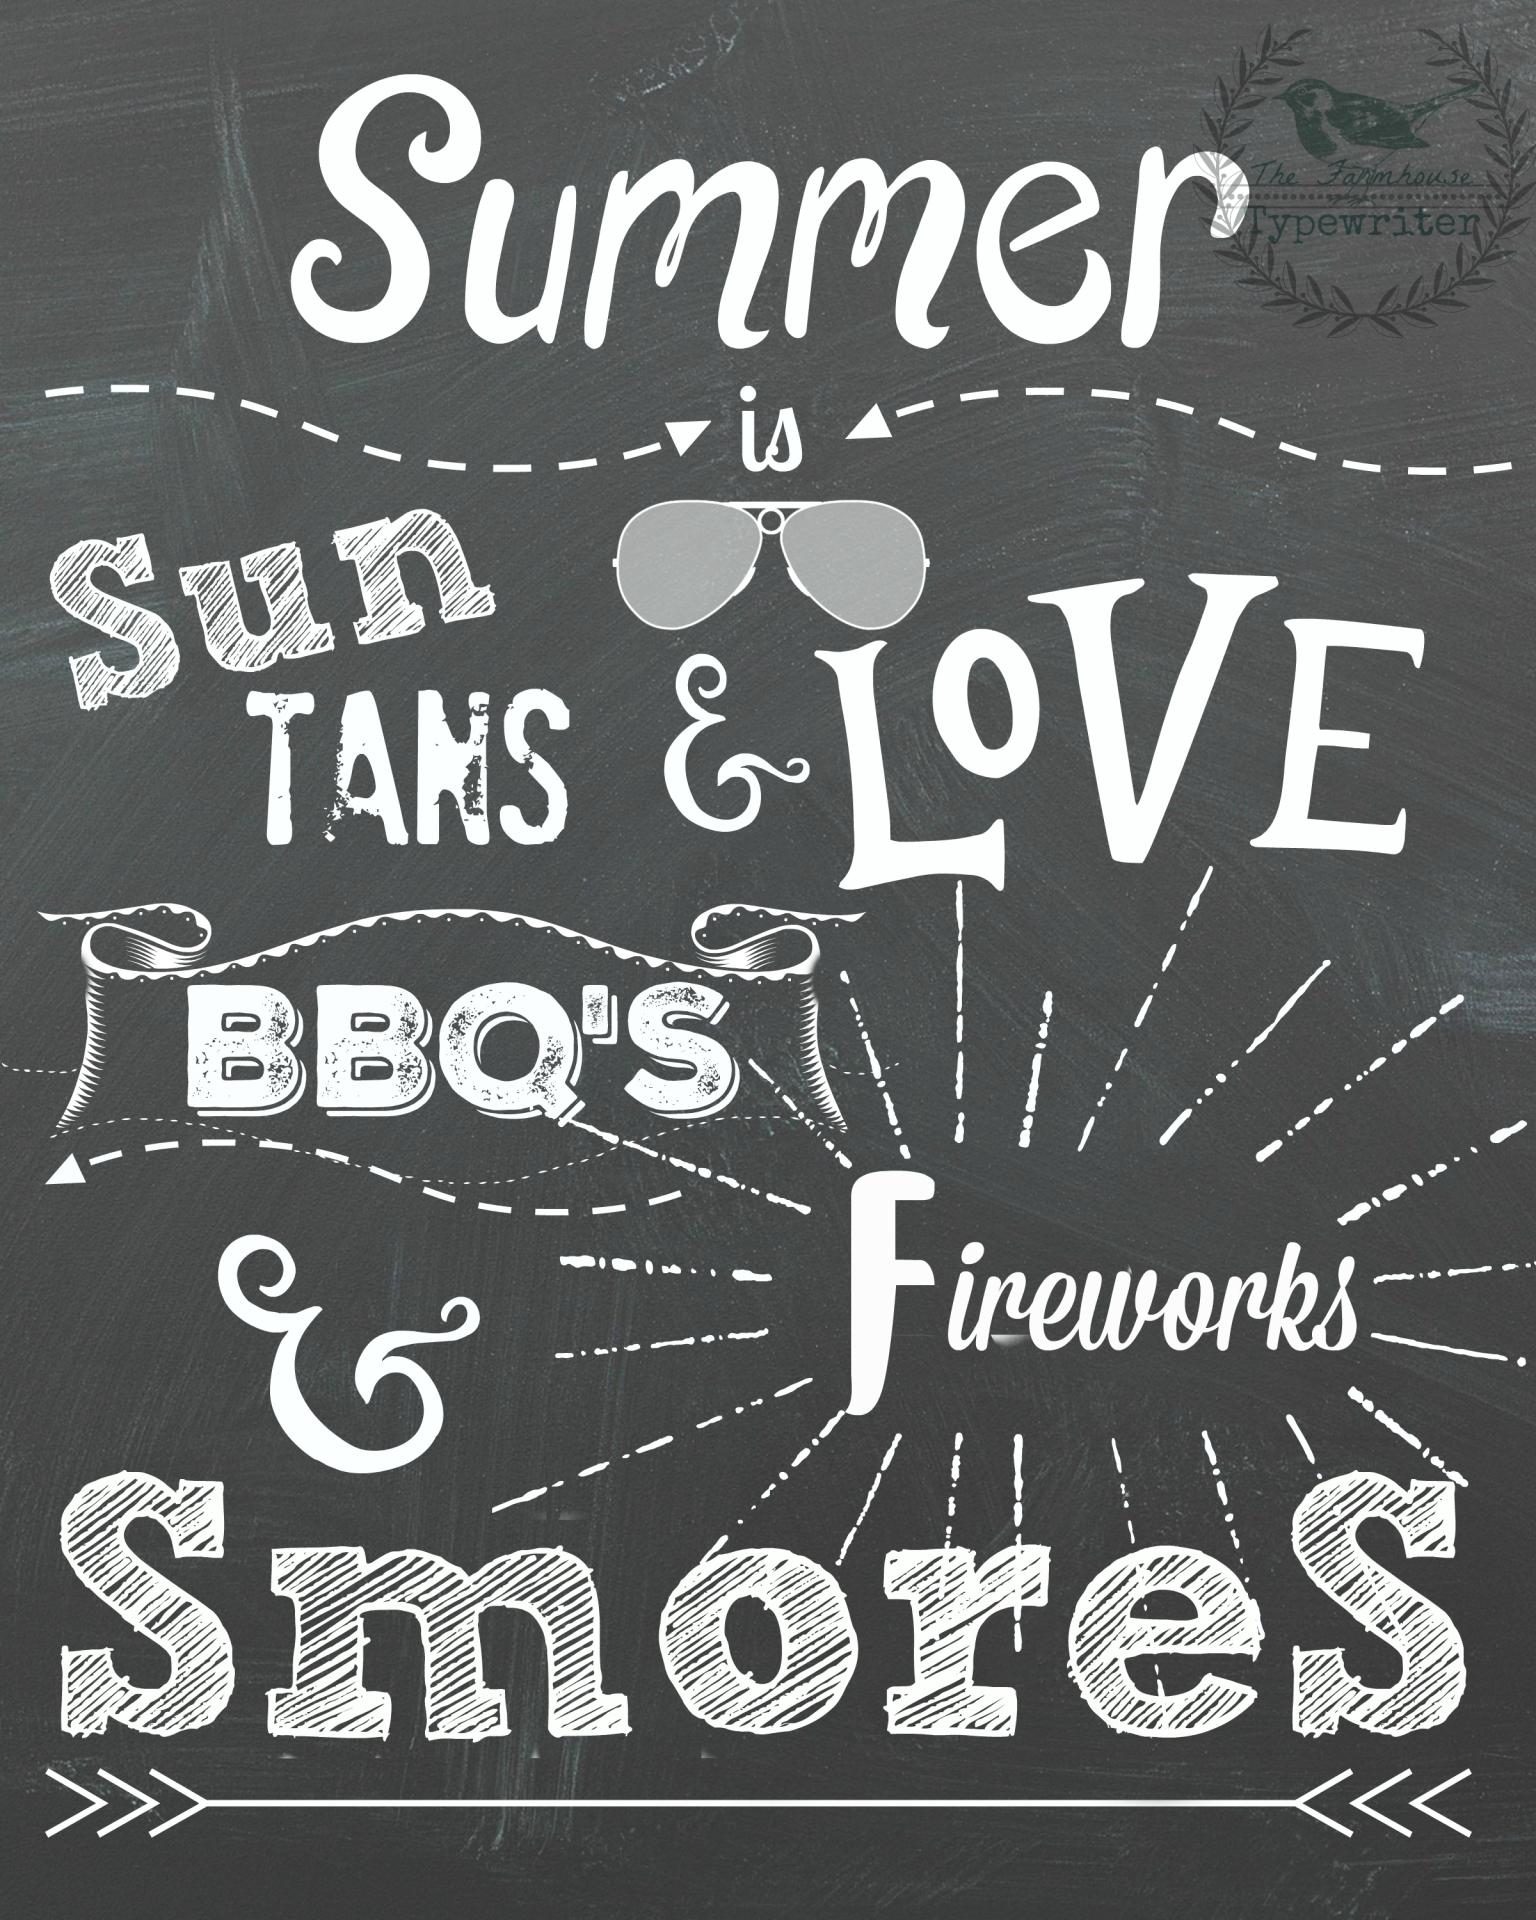 Summer chalkboard sign